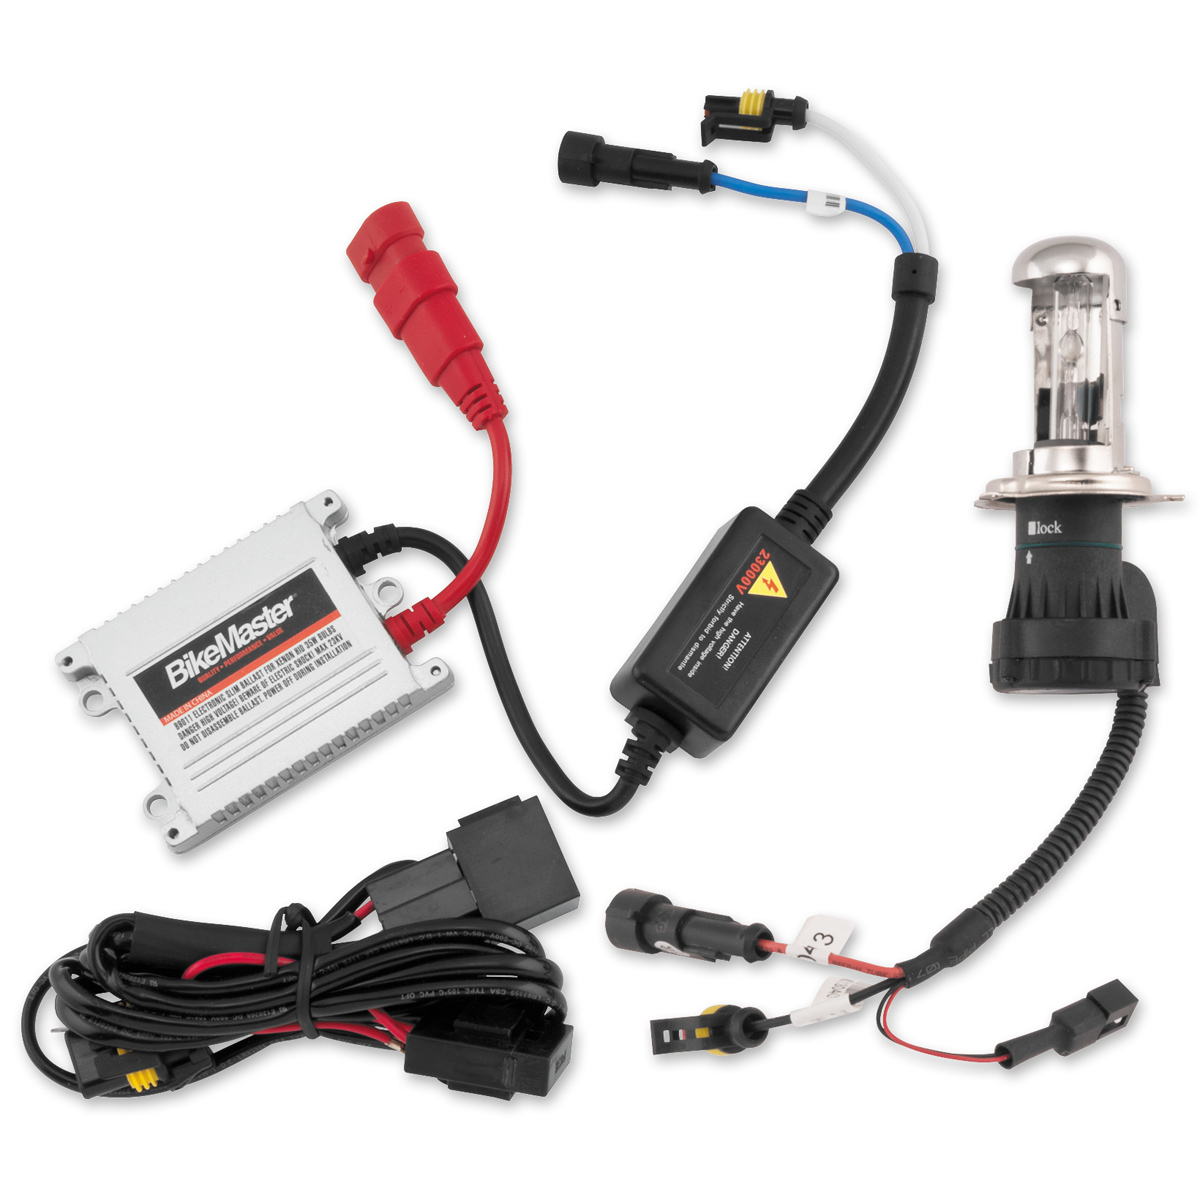 hight resolution of bikemaster hid light kits 6000k h7 white bulb